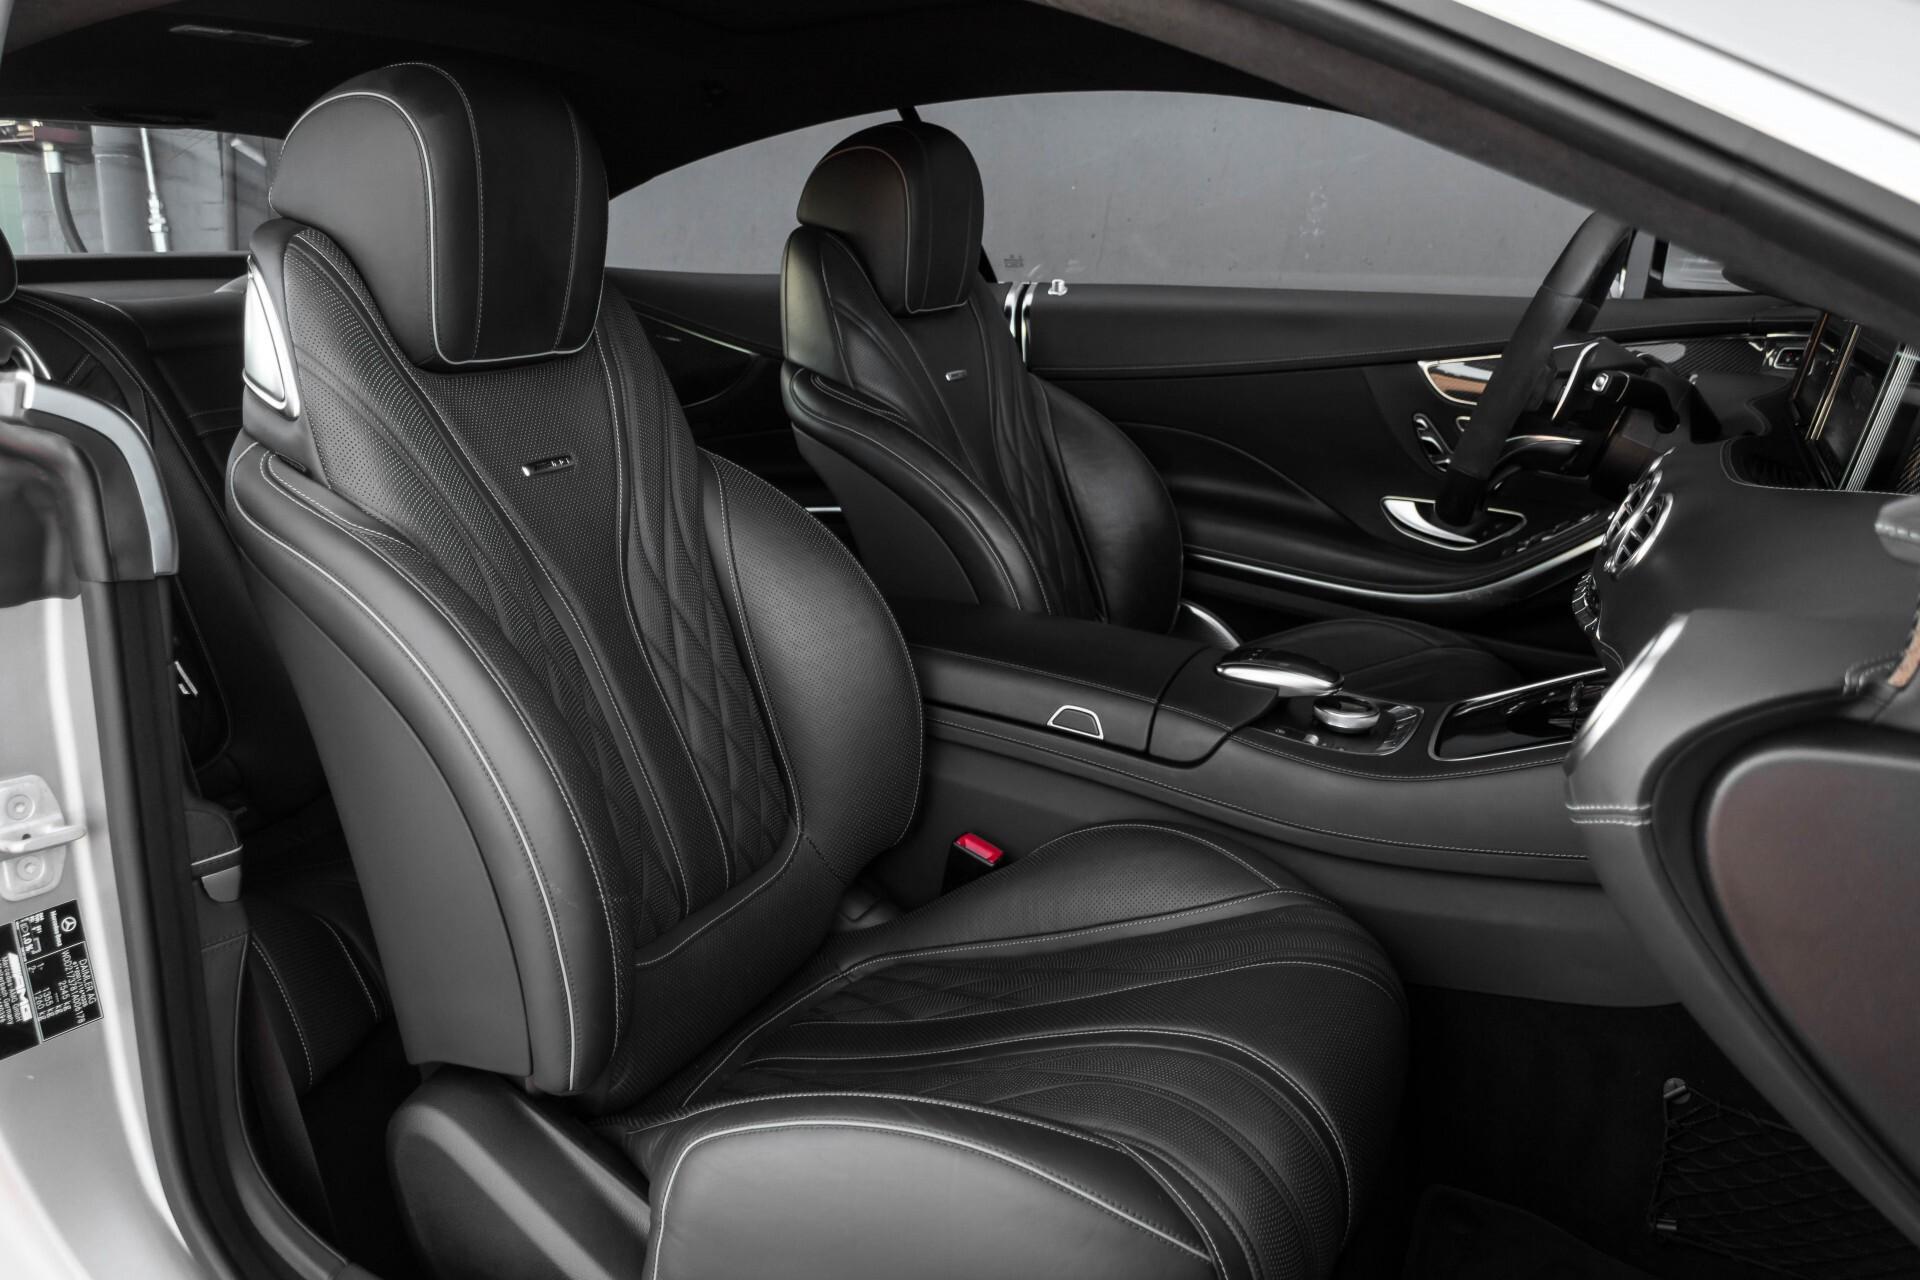 Mercedes-Benz S-Klasse Coupé 63 AMG 4-M Keramisch/Akrapovic/Swarowski/Designo/Burmester High End Aut7 Foto 3